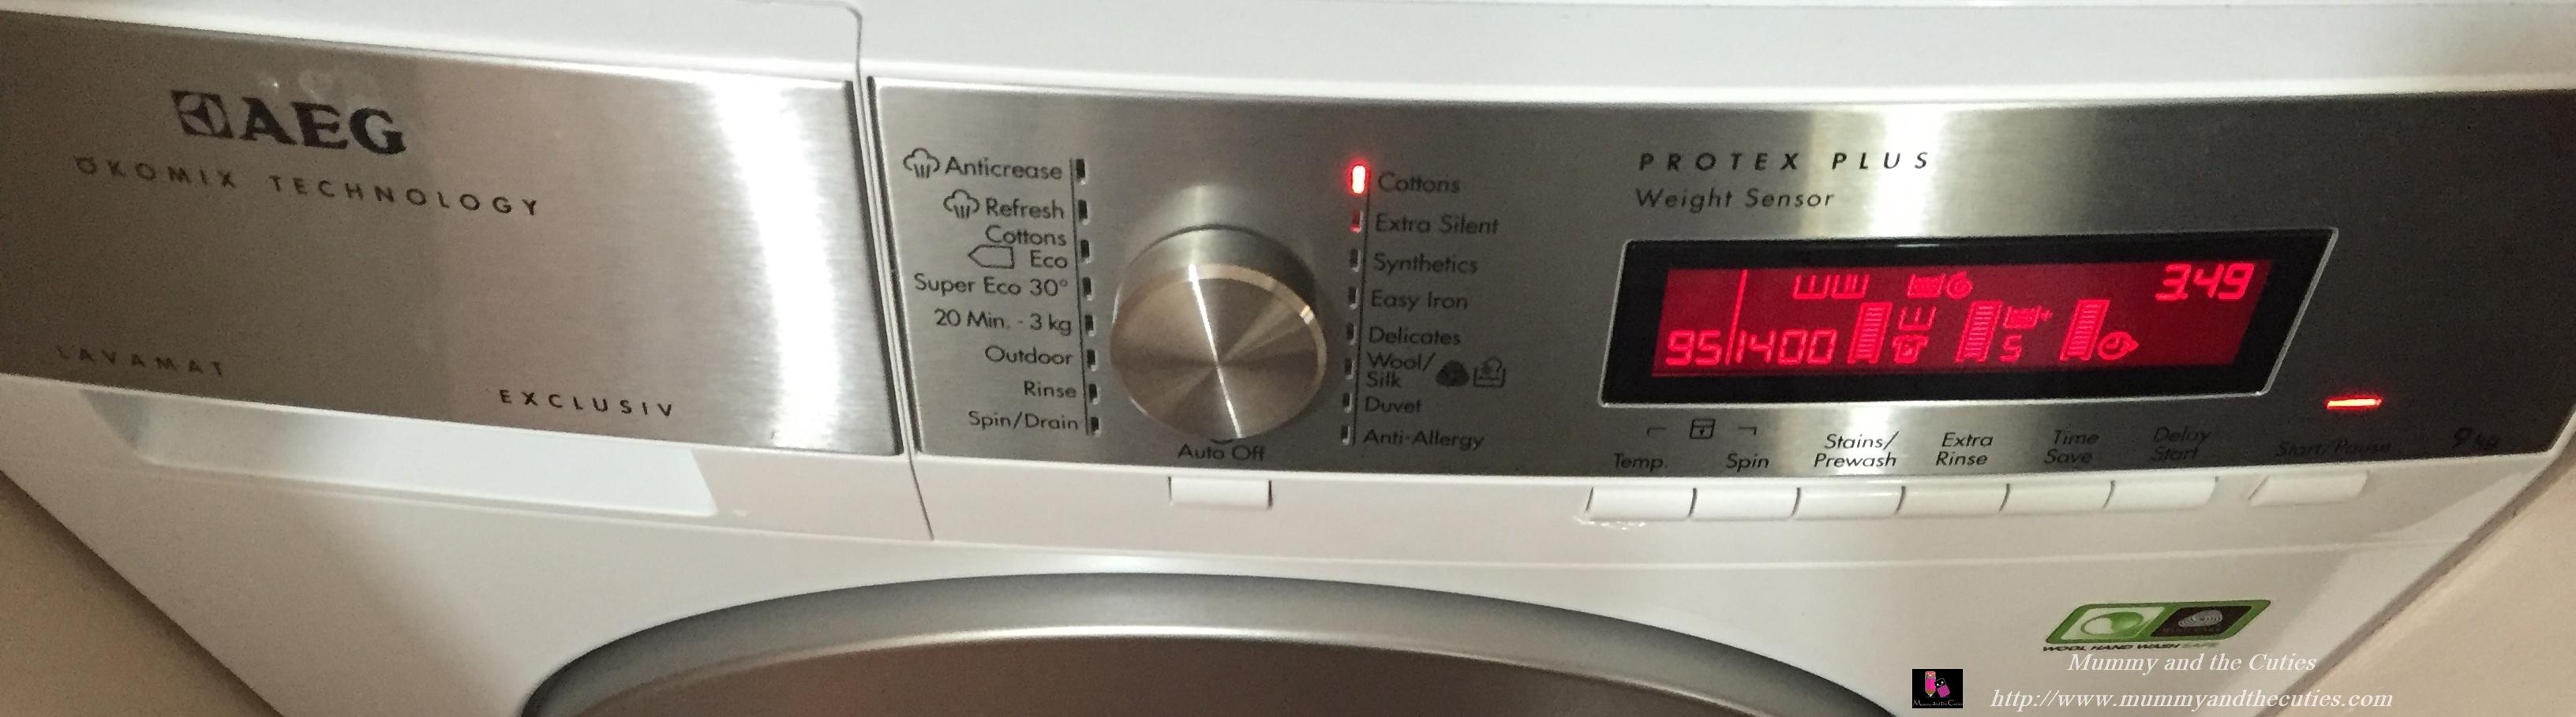 Uncategorized Aeg Kitchen Appliances Review aeg l89499fl washing machine review fresh school uniforms features supported by machine